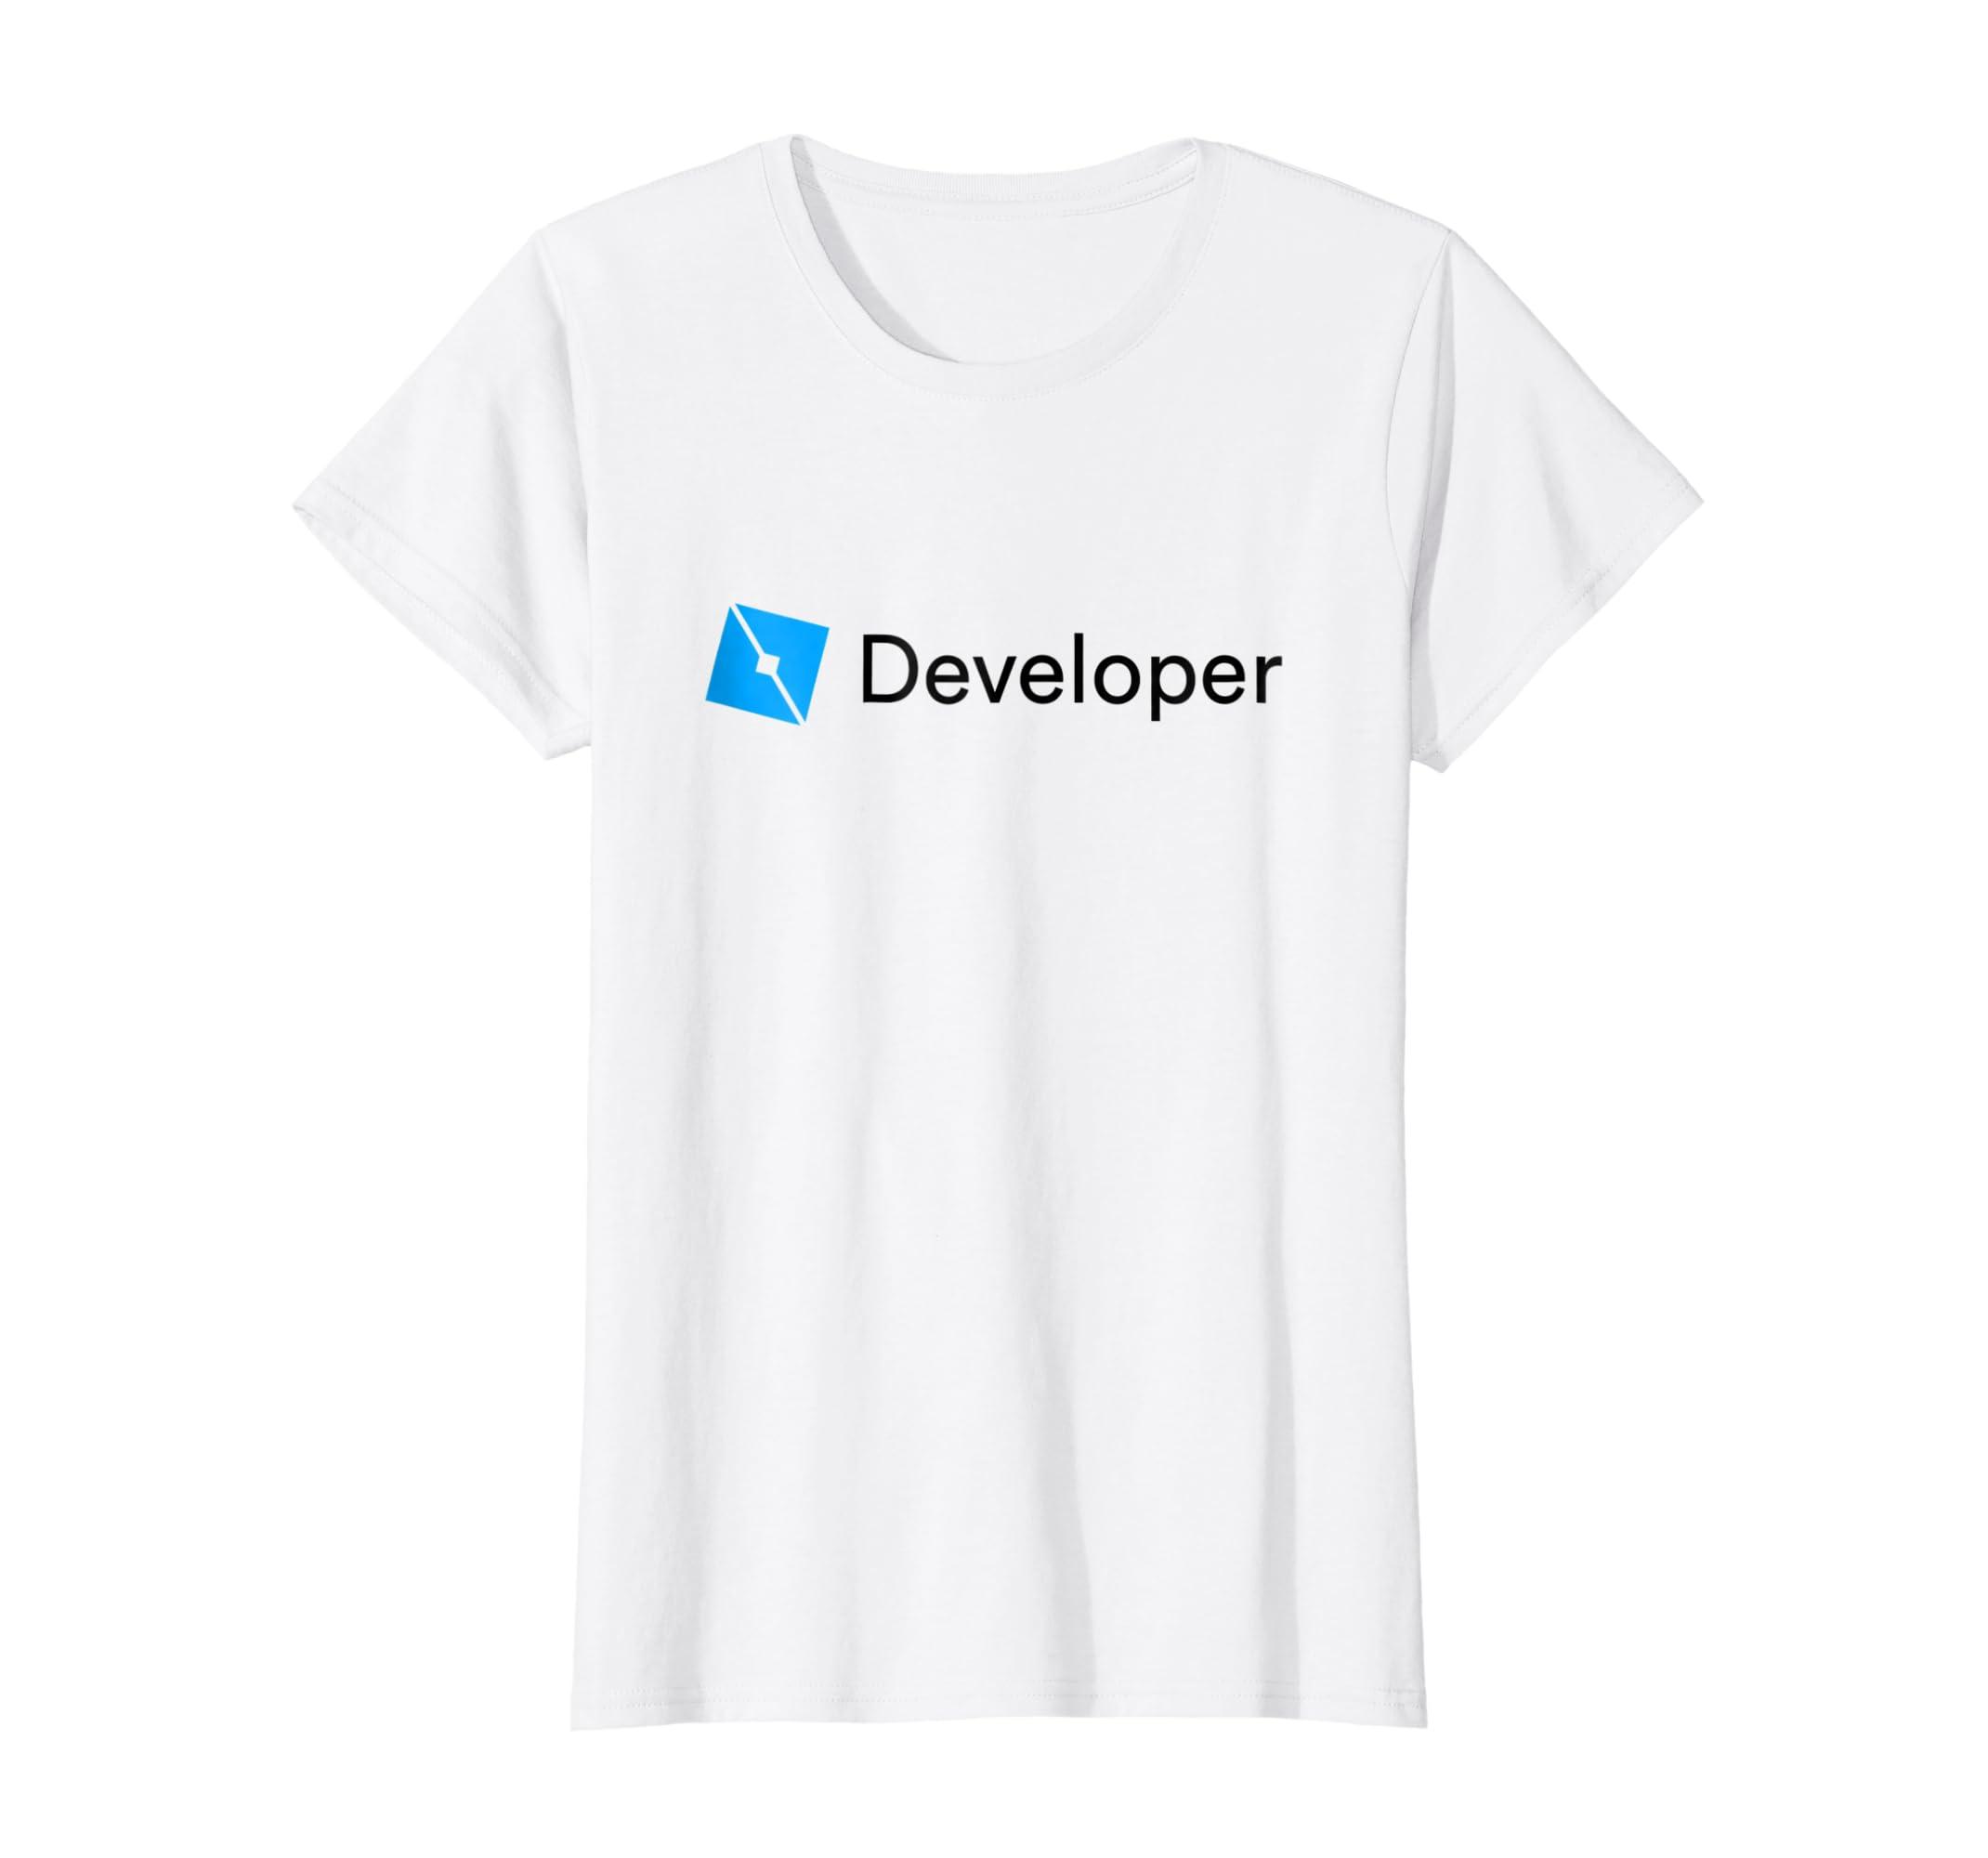 f2e79b55 Amazon.com: Roblox Studio Developer T-Shirt: Clothing